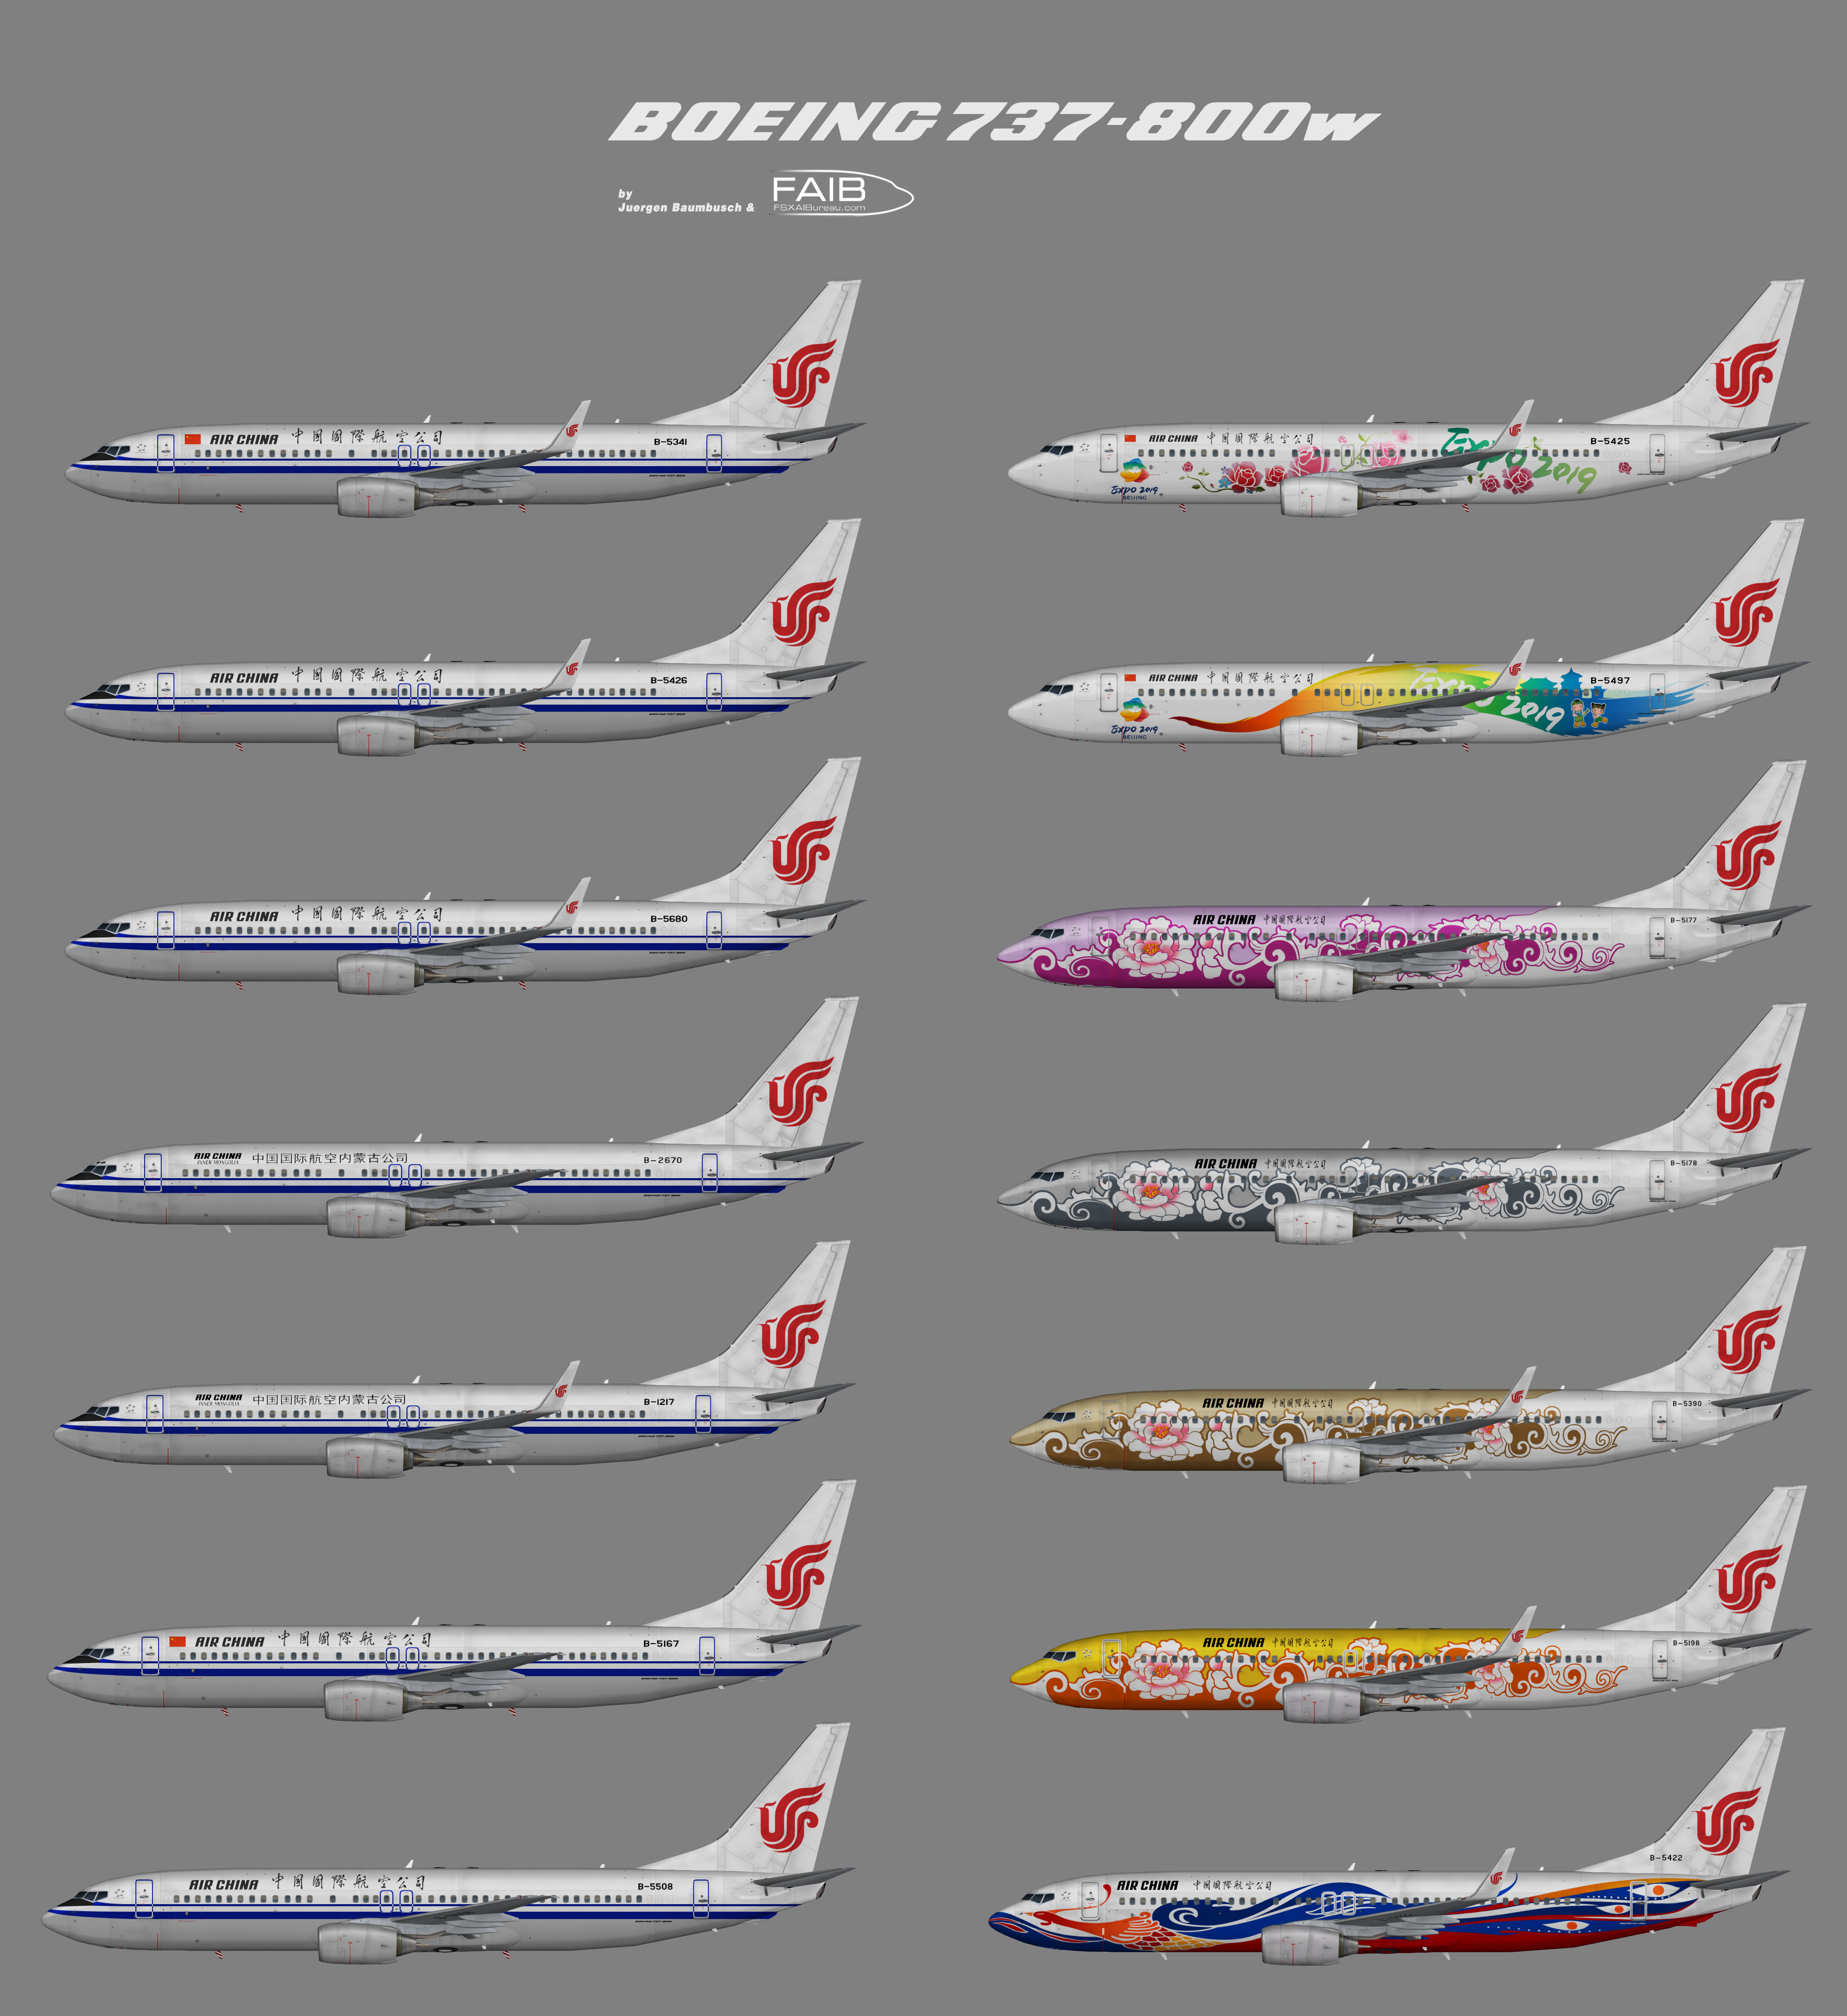 Air China Boeing 737-800/w